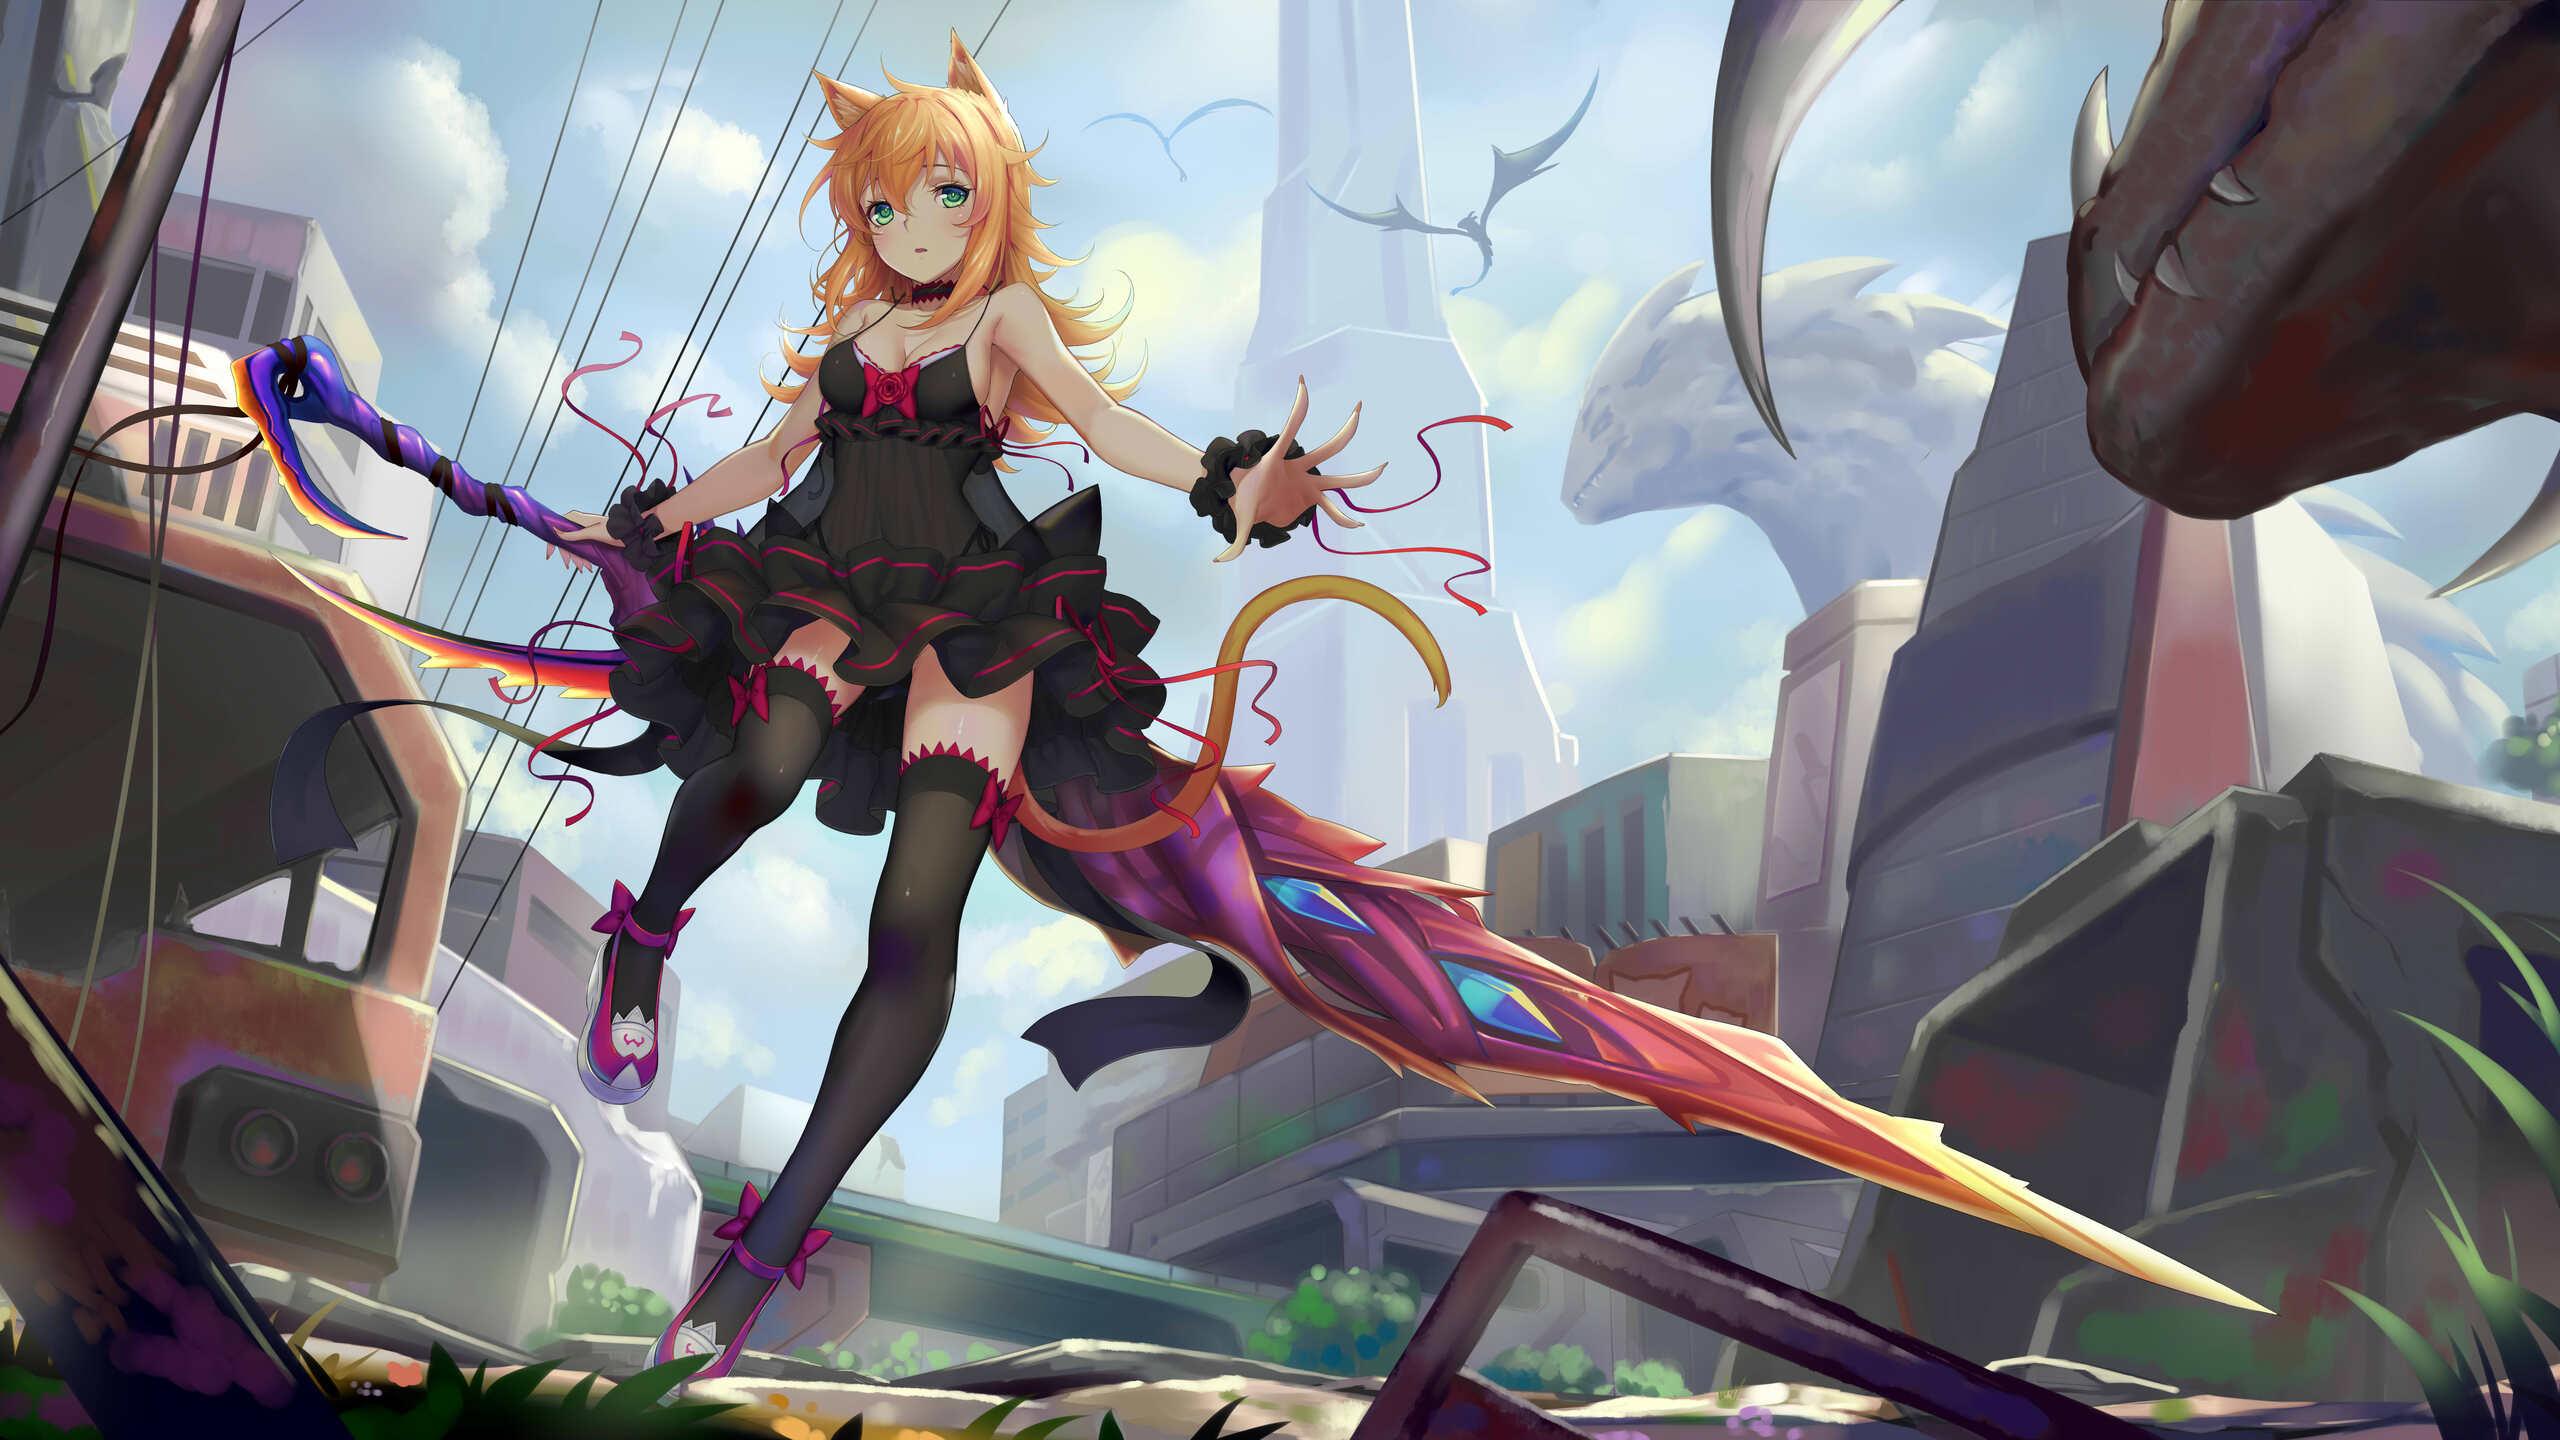 2560x1440 Anime Women Sword 8k 1440P Resolution HD 4k ...